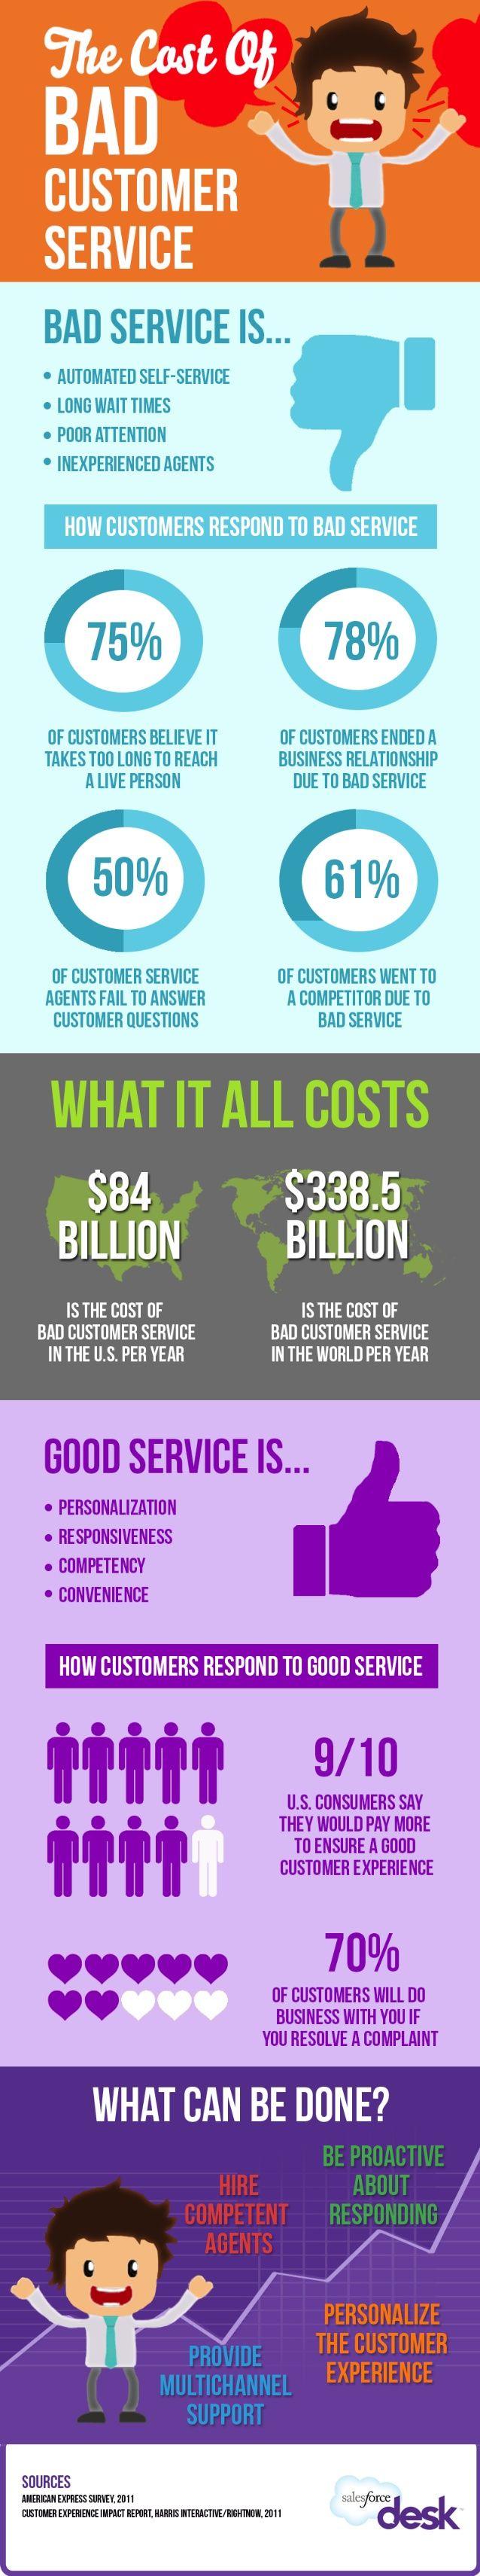 The True Cost of Bad Customer Service by Desk via slideshare